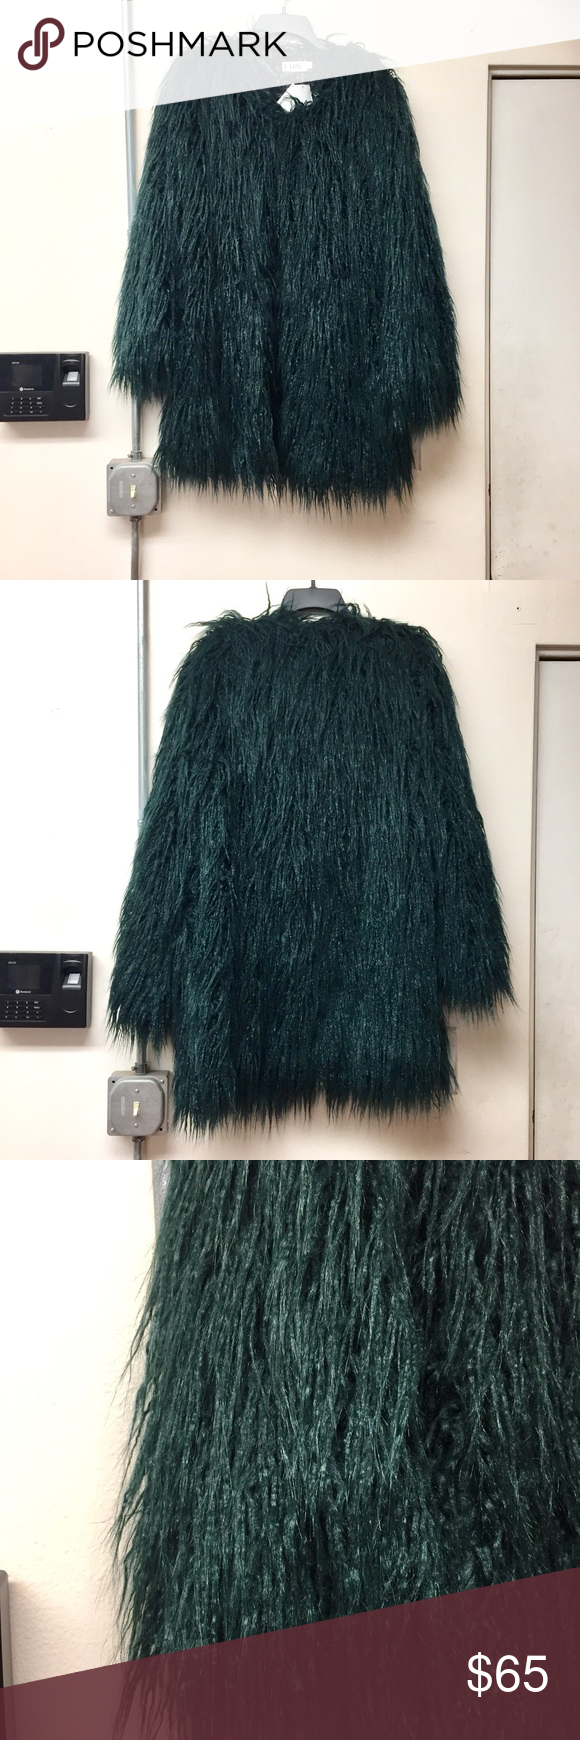 2ca39d859e8c LARK Shaggy Green Fur Coat Brand new LARK forest green coat. Black lace  lining lark Jackets & Coats